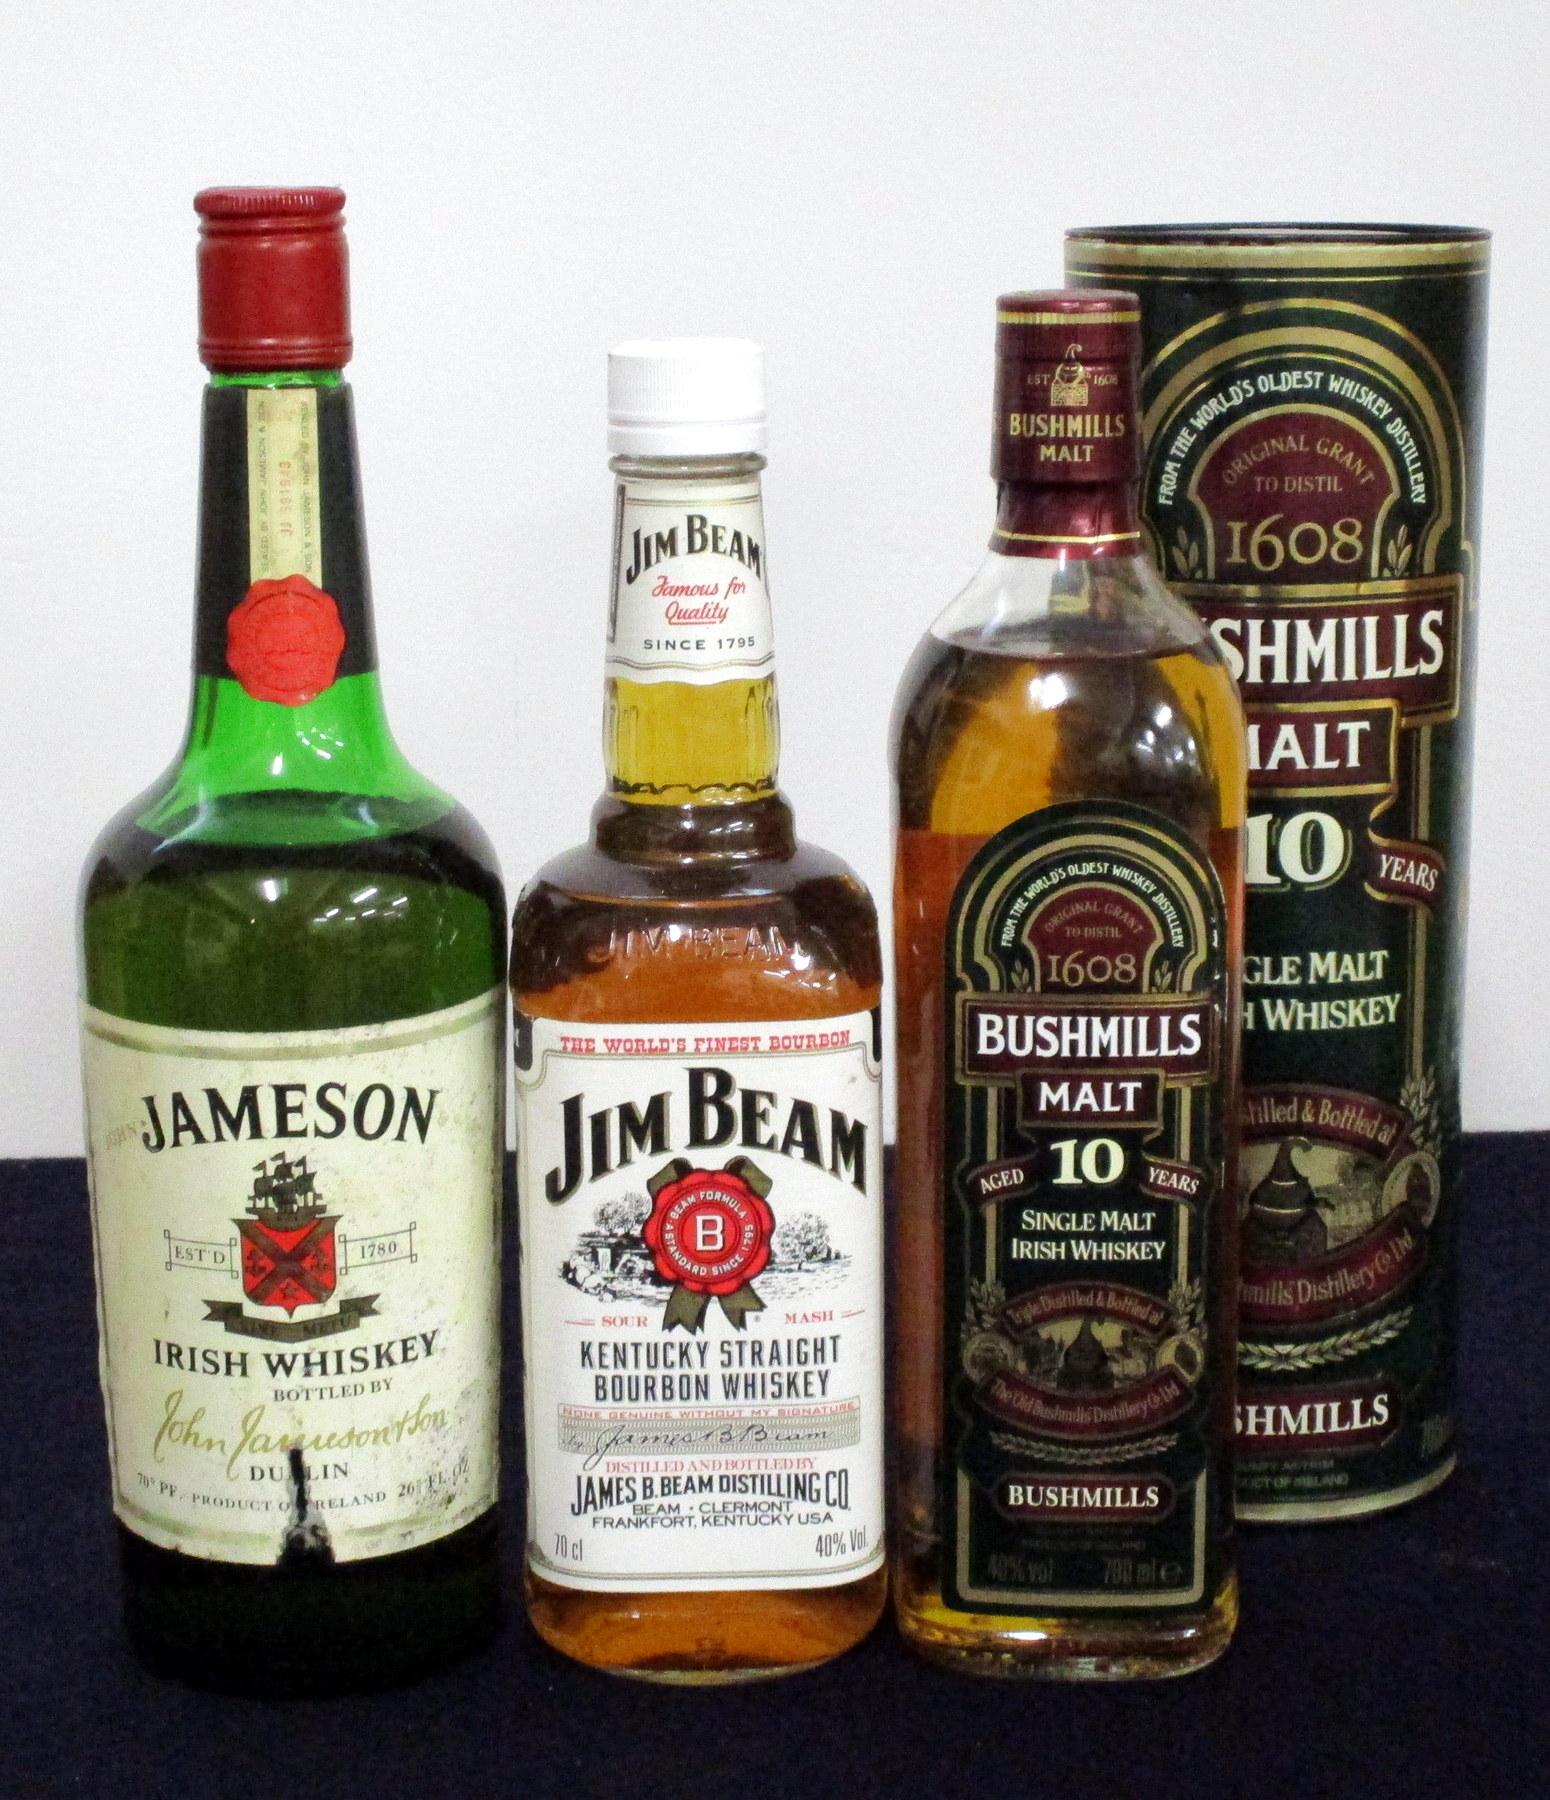 1 26 2/3 fl oz bt Jameson Irish Whiskey 70° proof sl cd/aged label, sl ullaged (us) 1 70-cl bt Jim